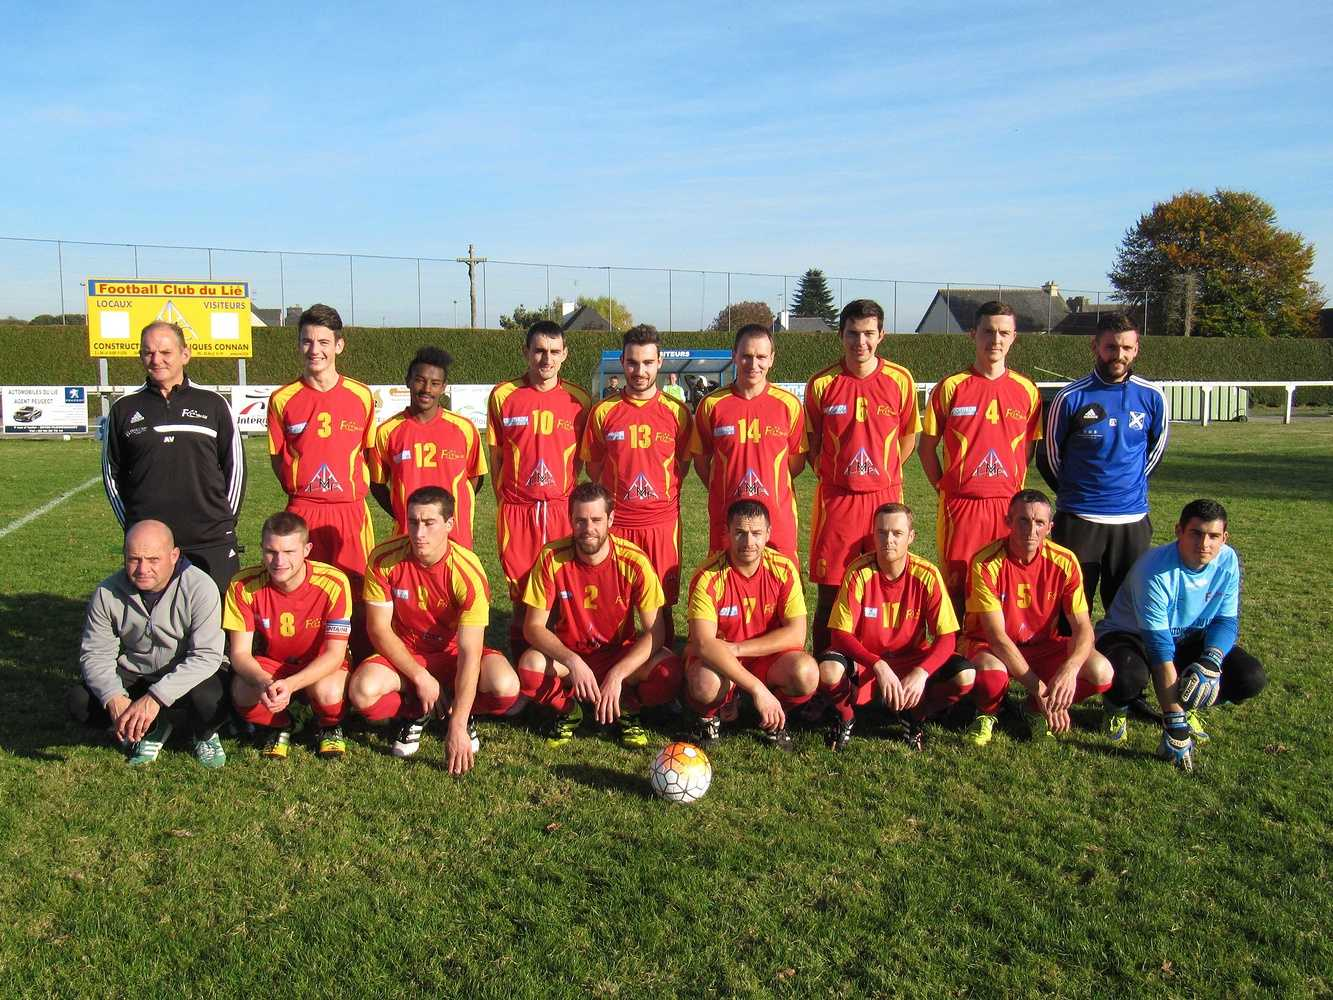 Football Club du Lié img4911